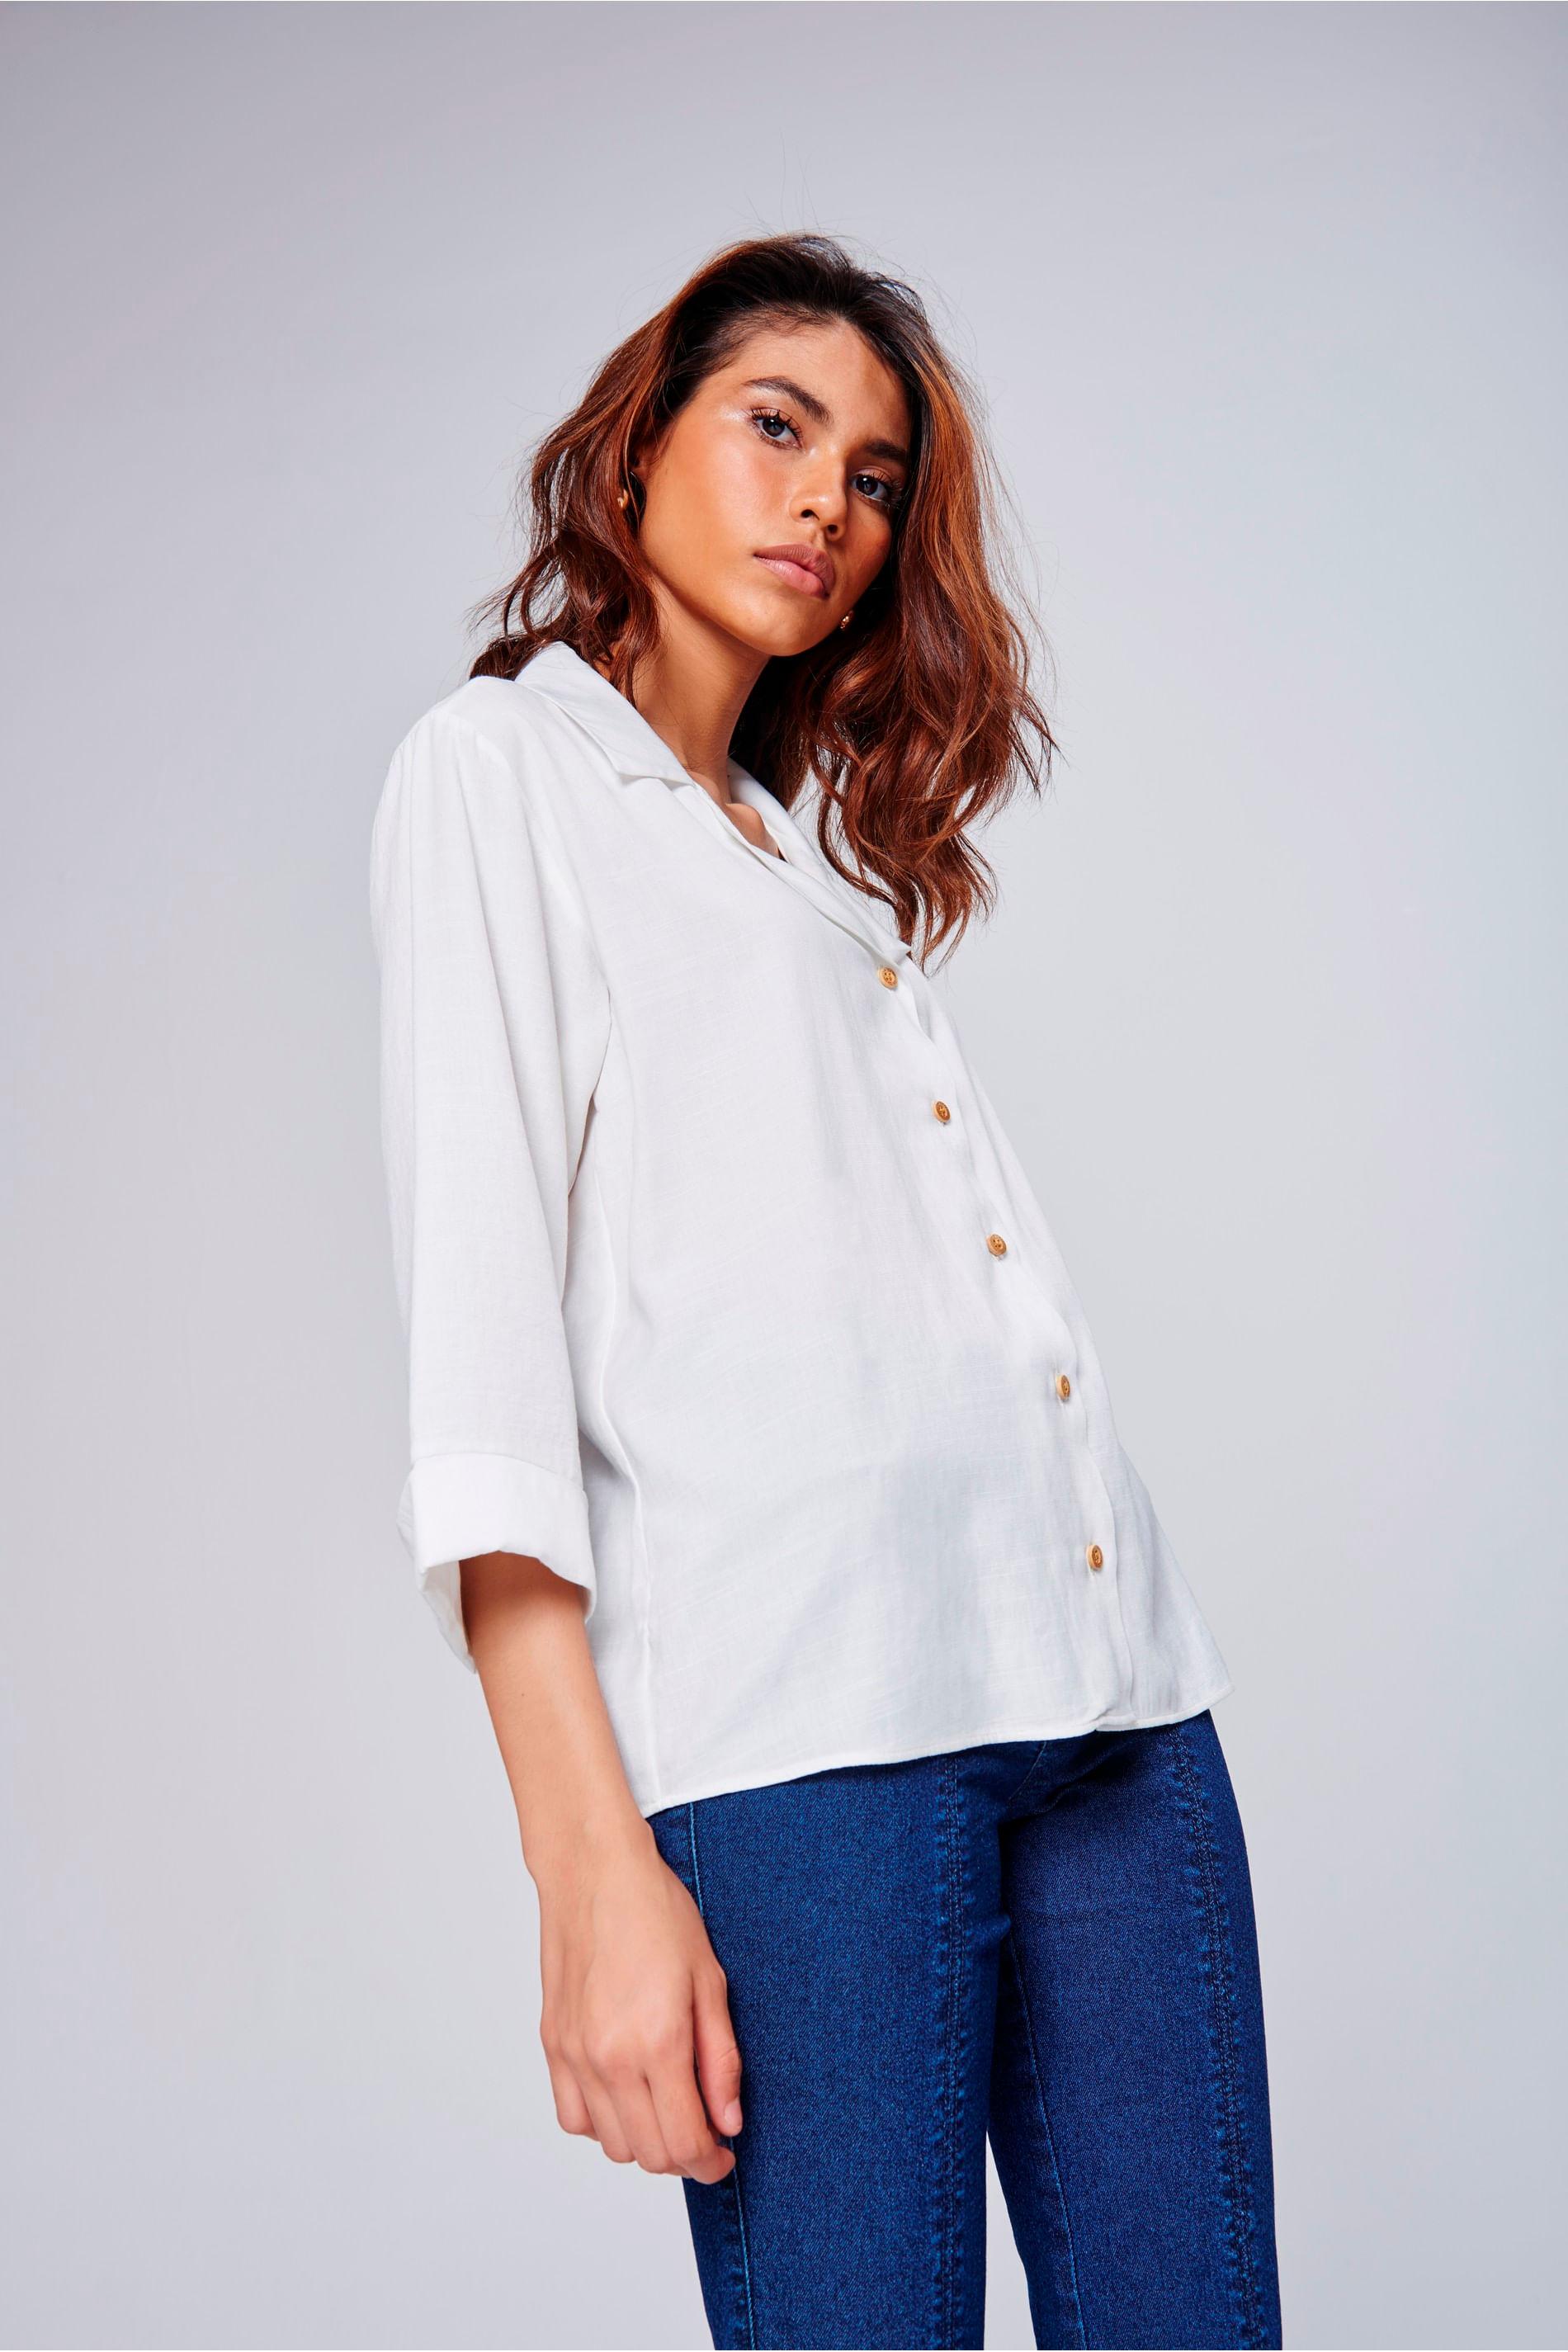 52ac91532f Camisa Social Feminina - Tam  PP   Cor  OFF-WHITE